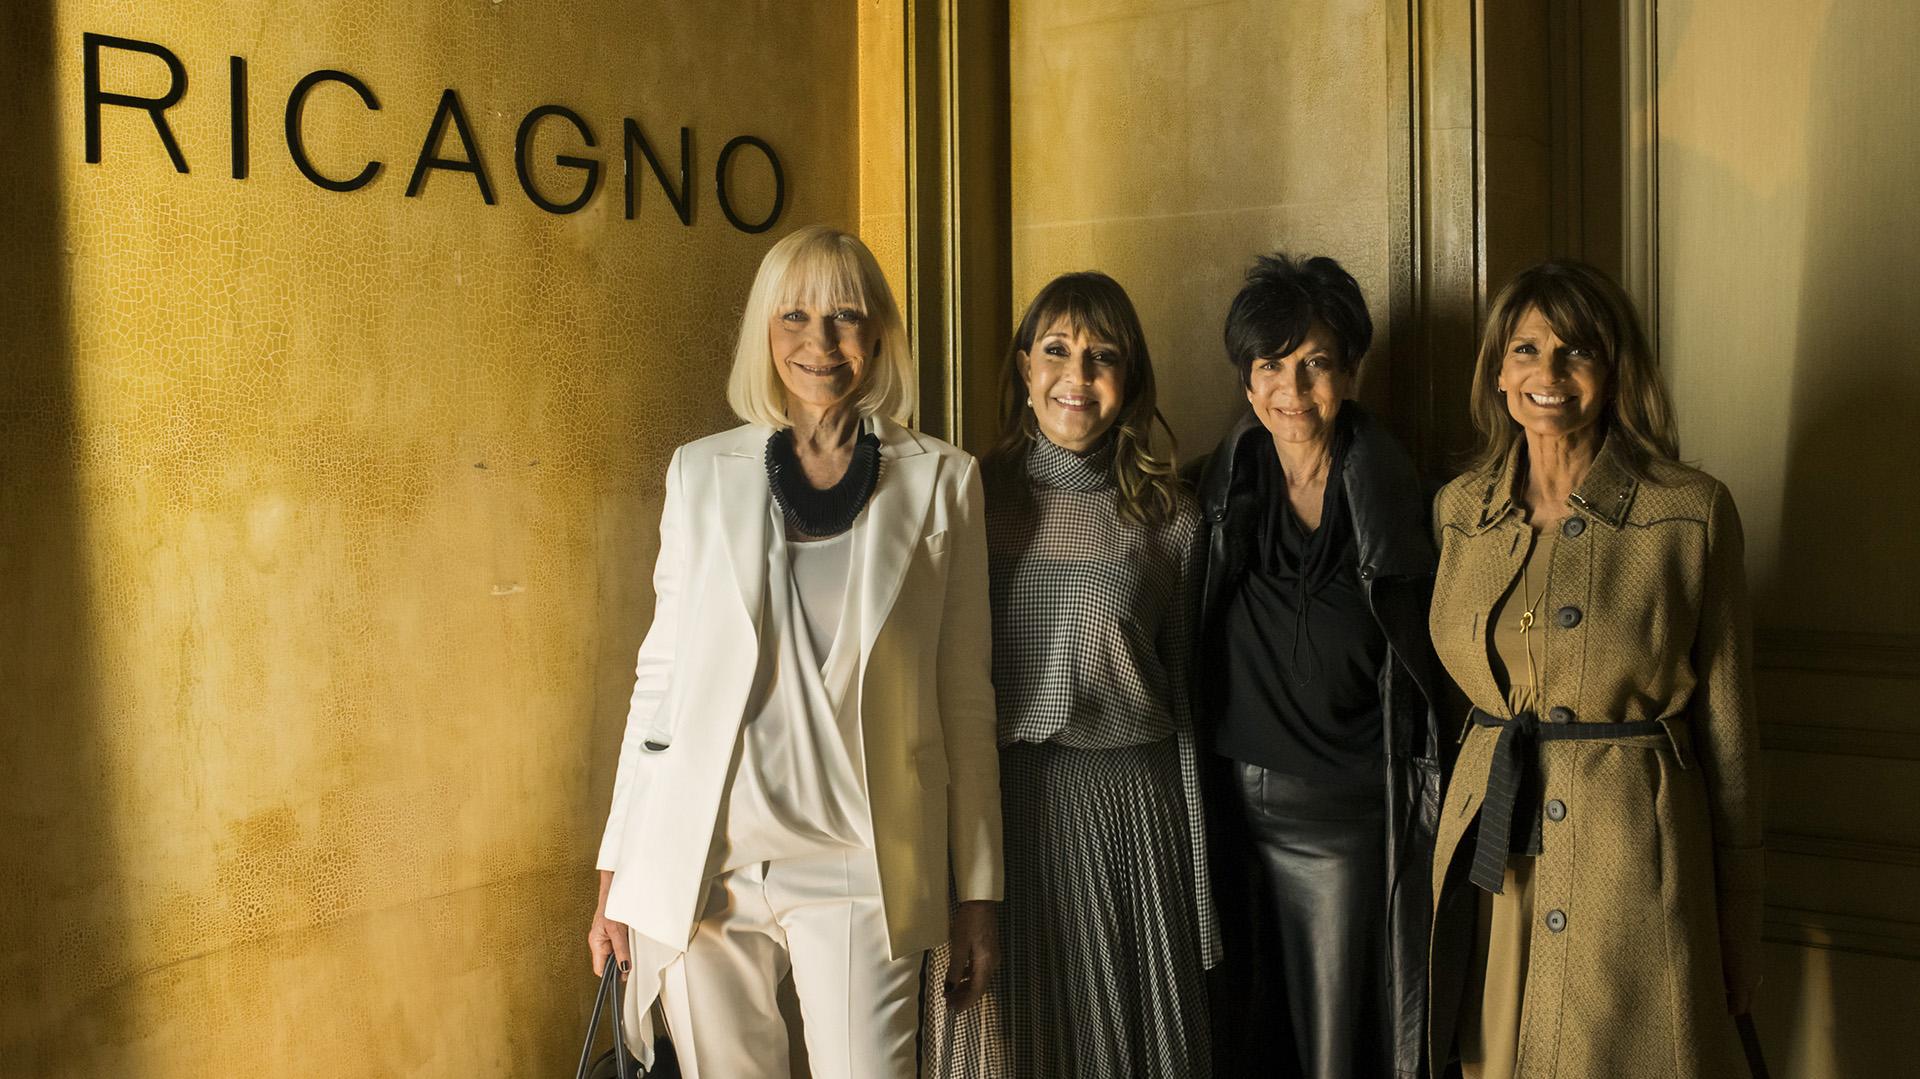 Teresa Frias, Fabiana Ricagno, Mónica Gutiérrez y Teresa Calandra